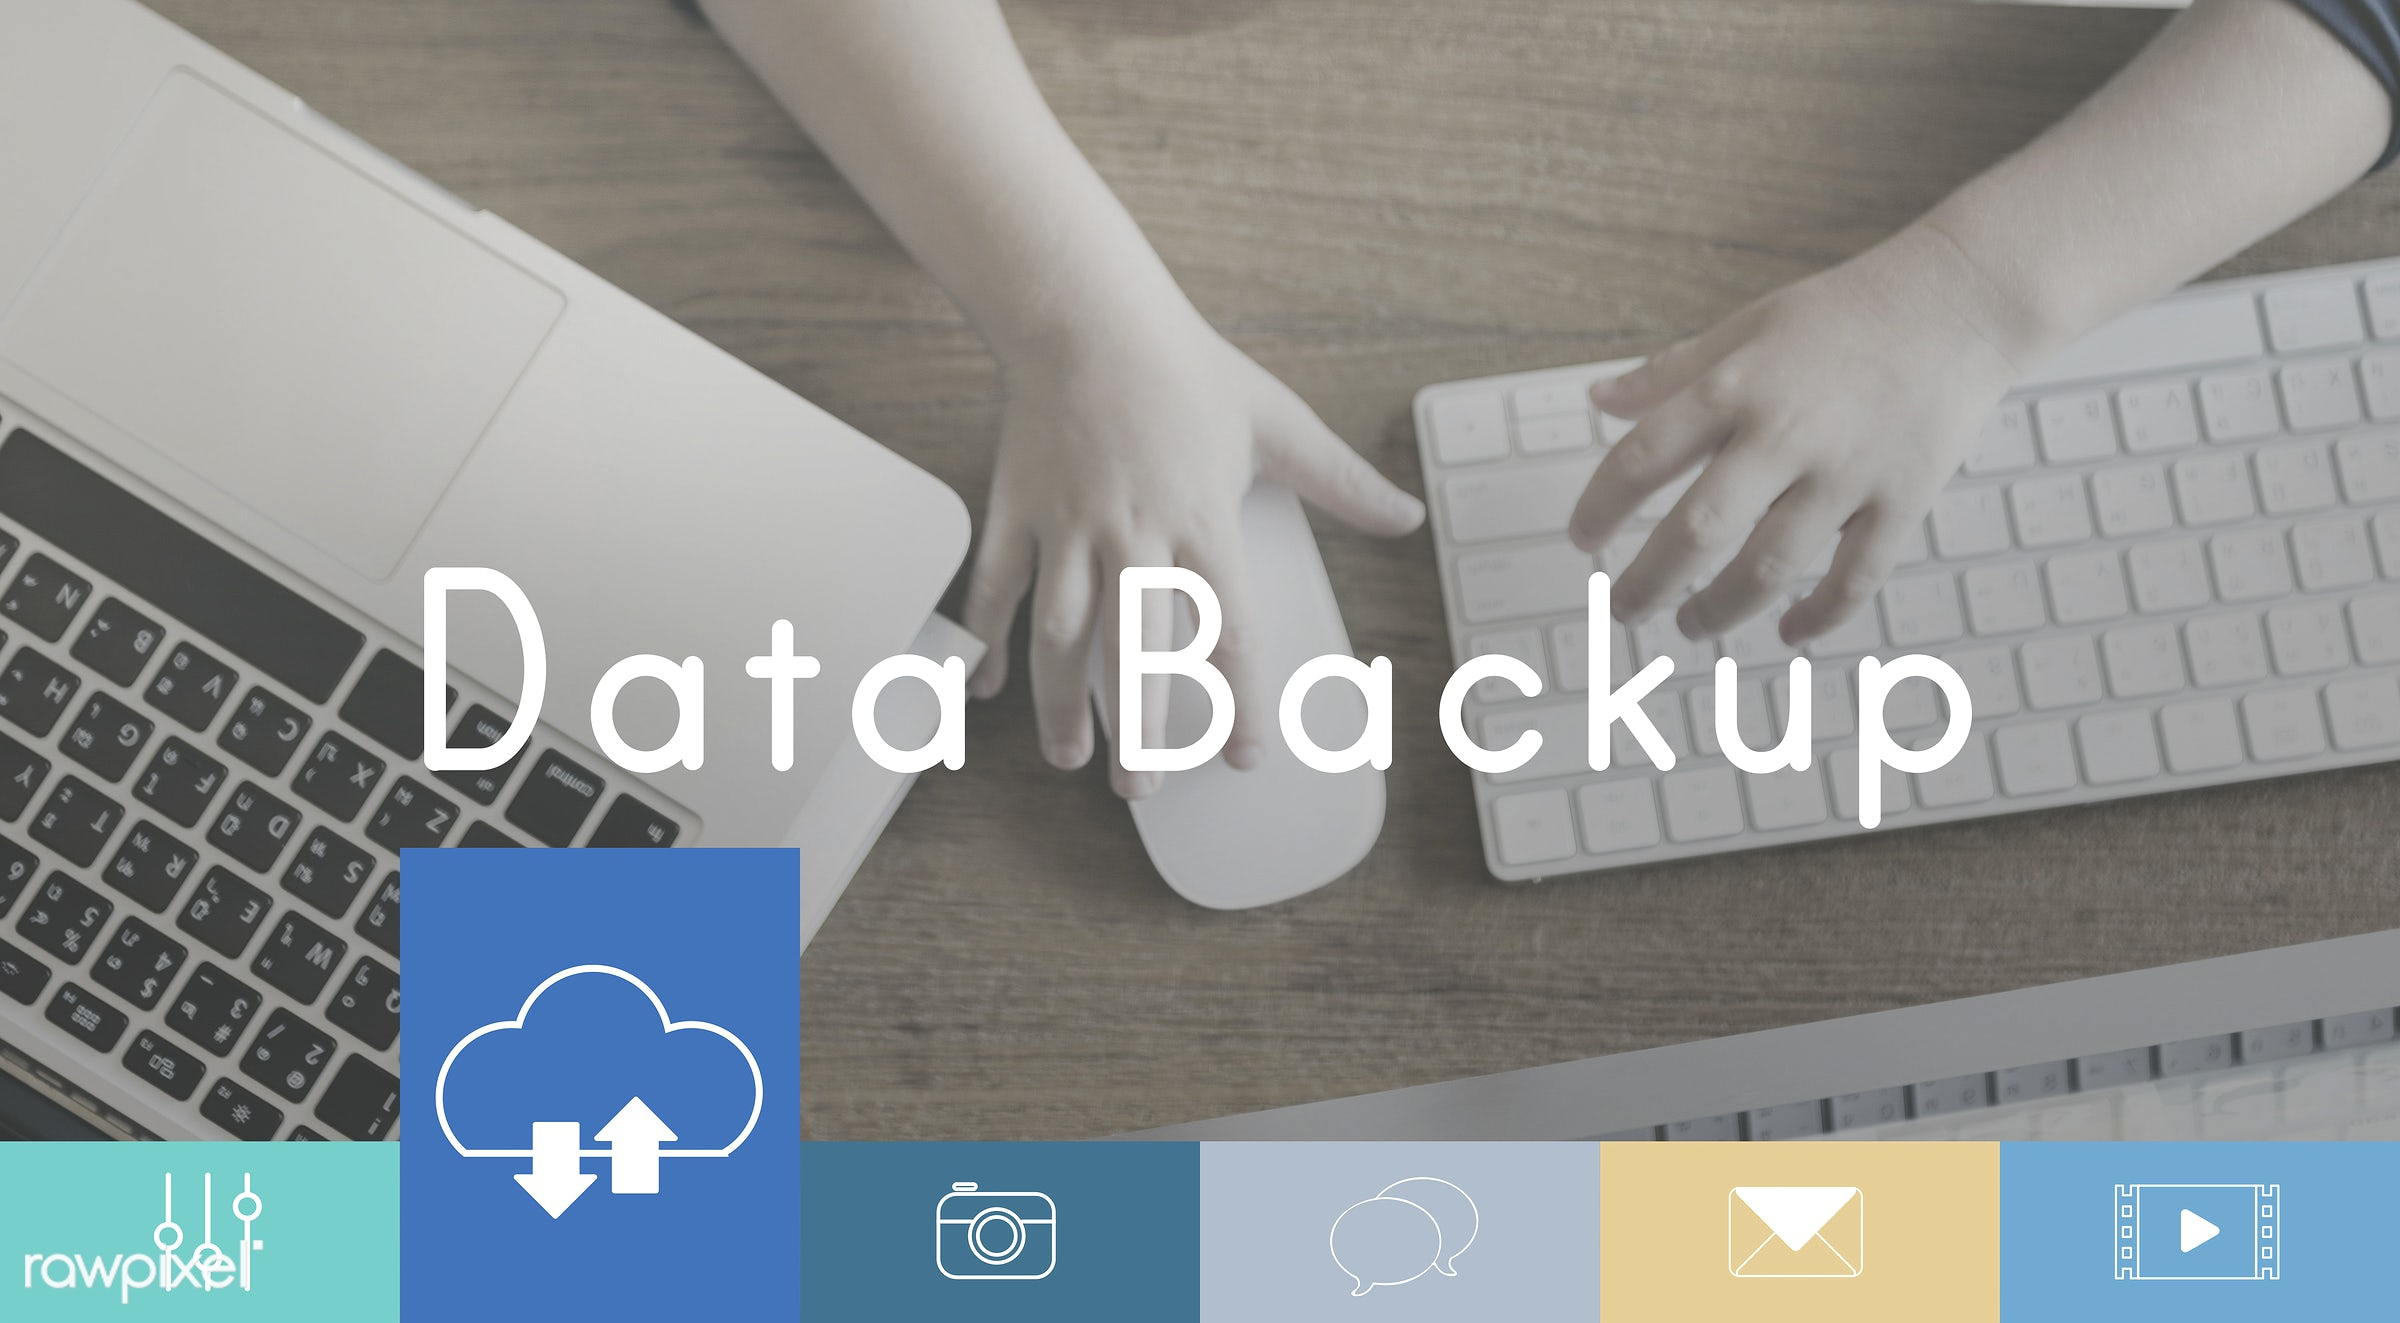 backup, big data, click, cloud, computer, computing, connection, data, data center, database, development, devices, digital...